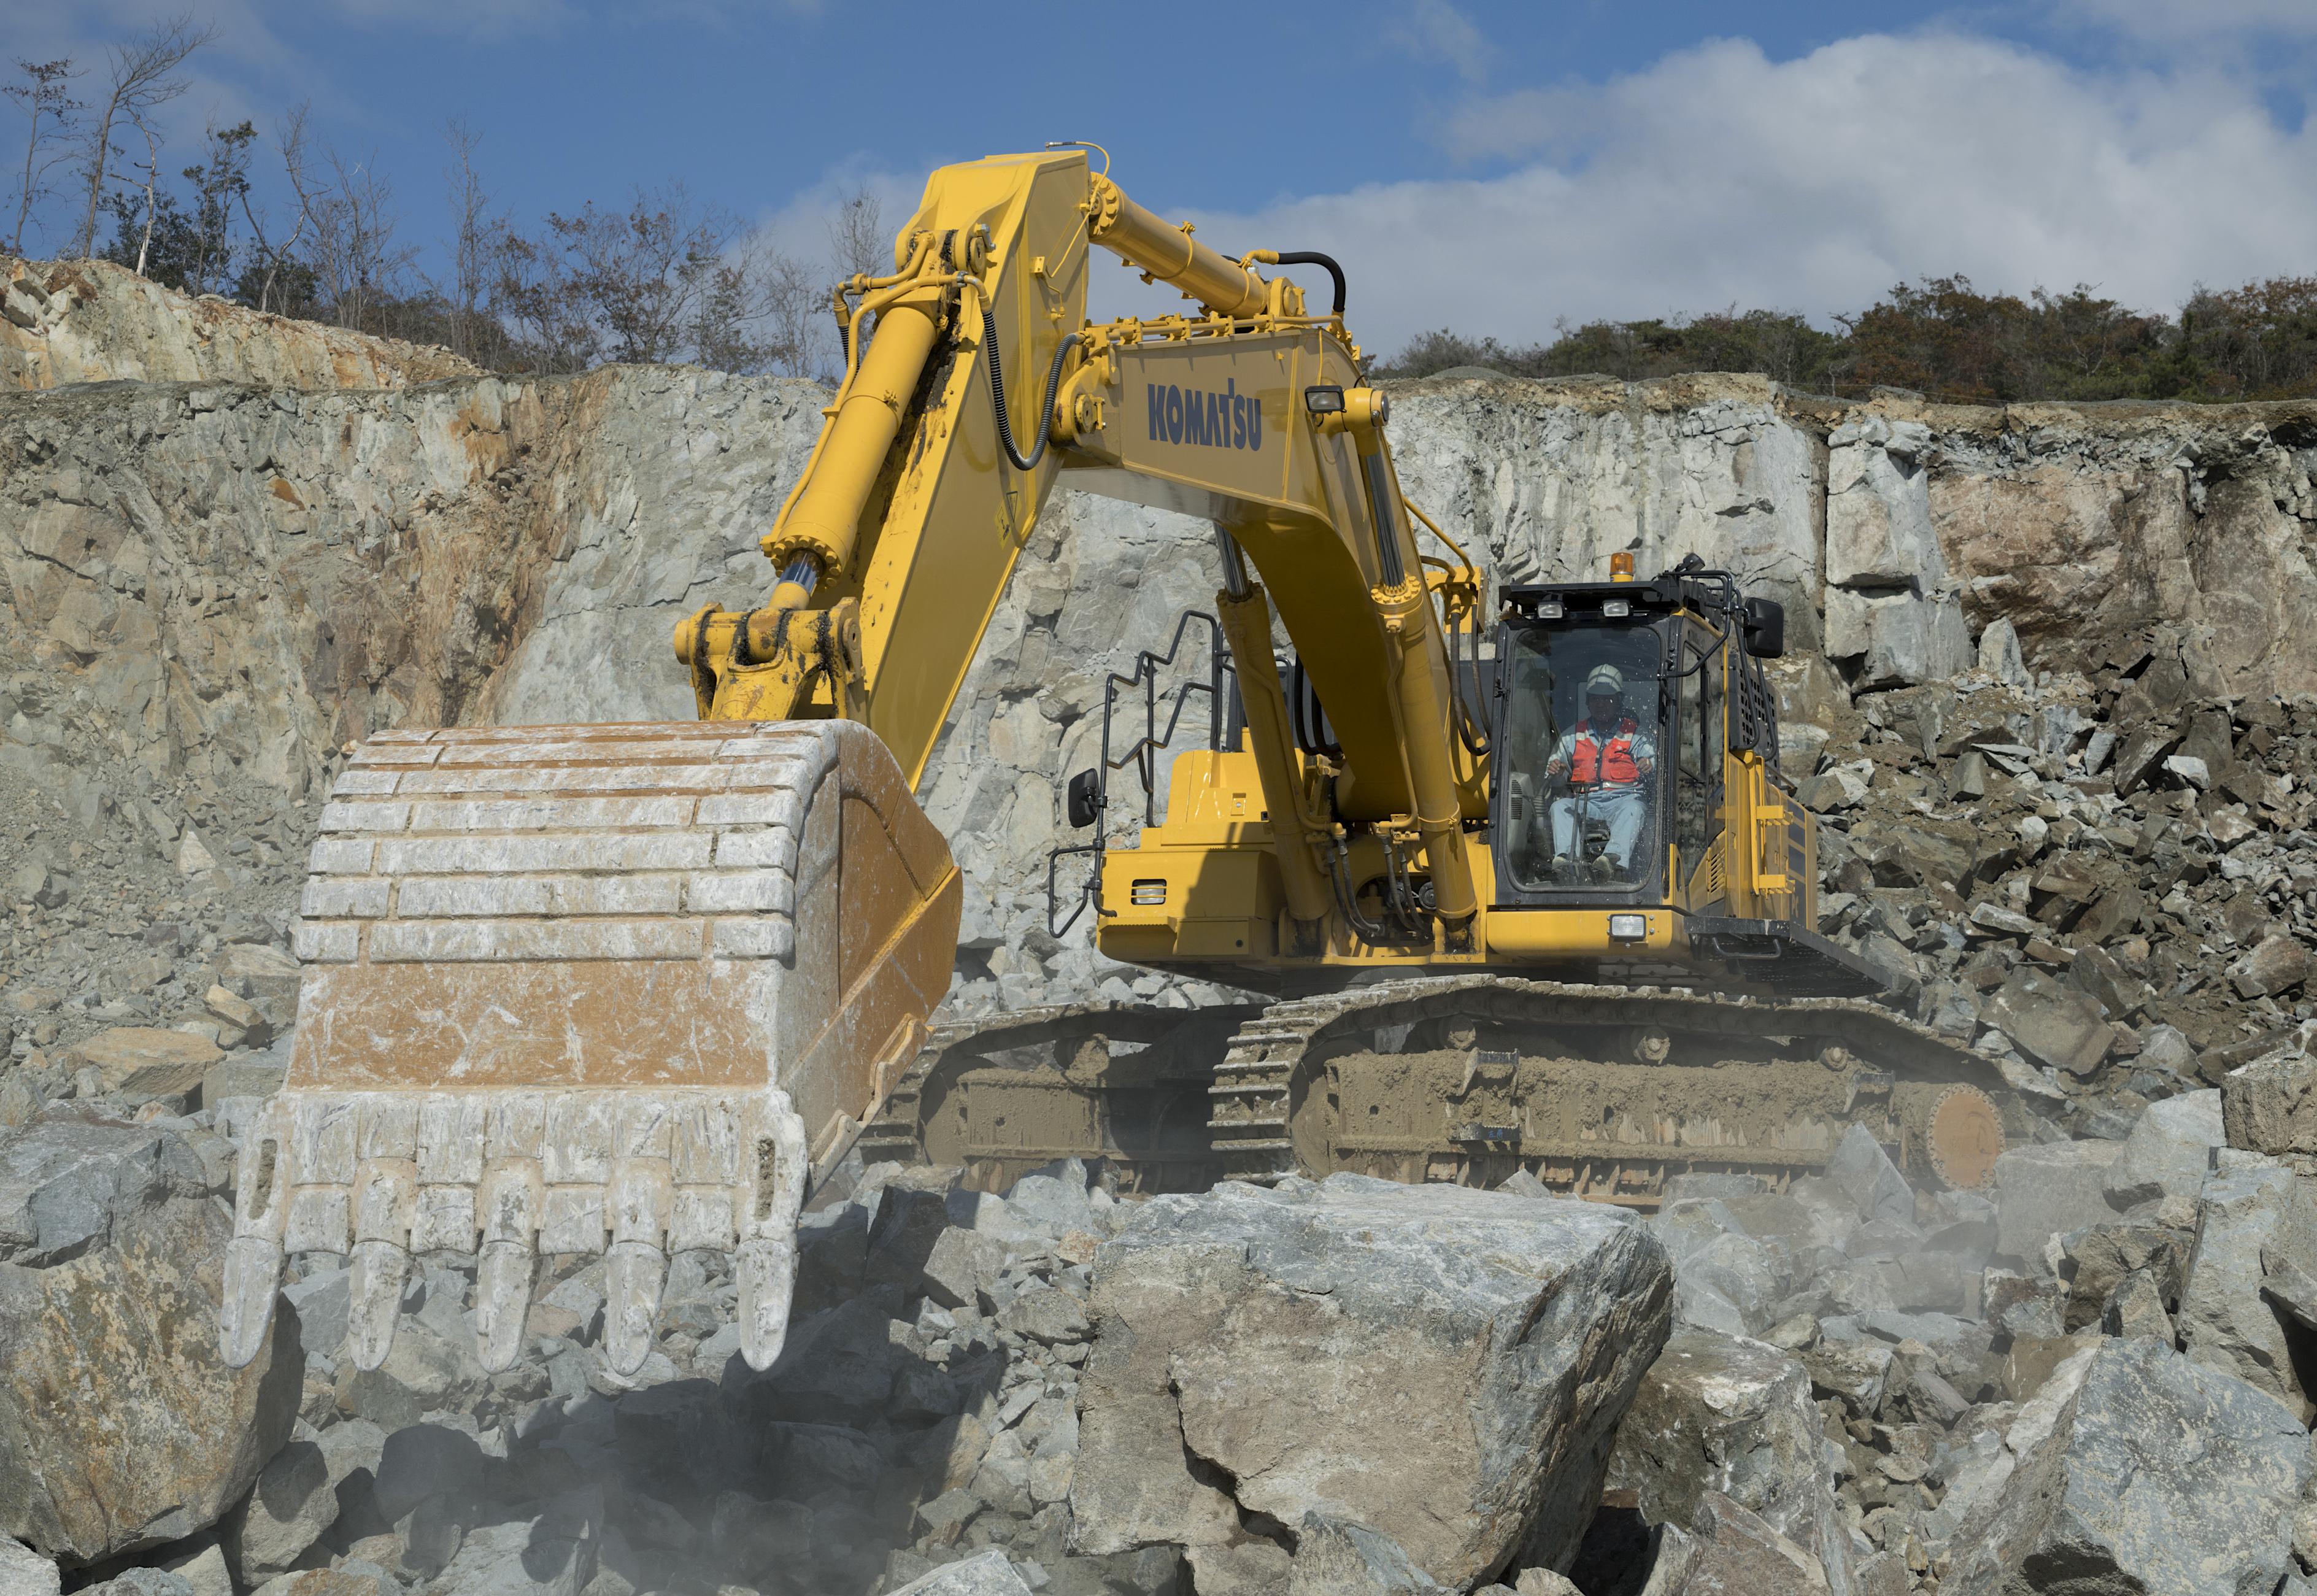 Komatsu PC650LC Excavator